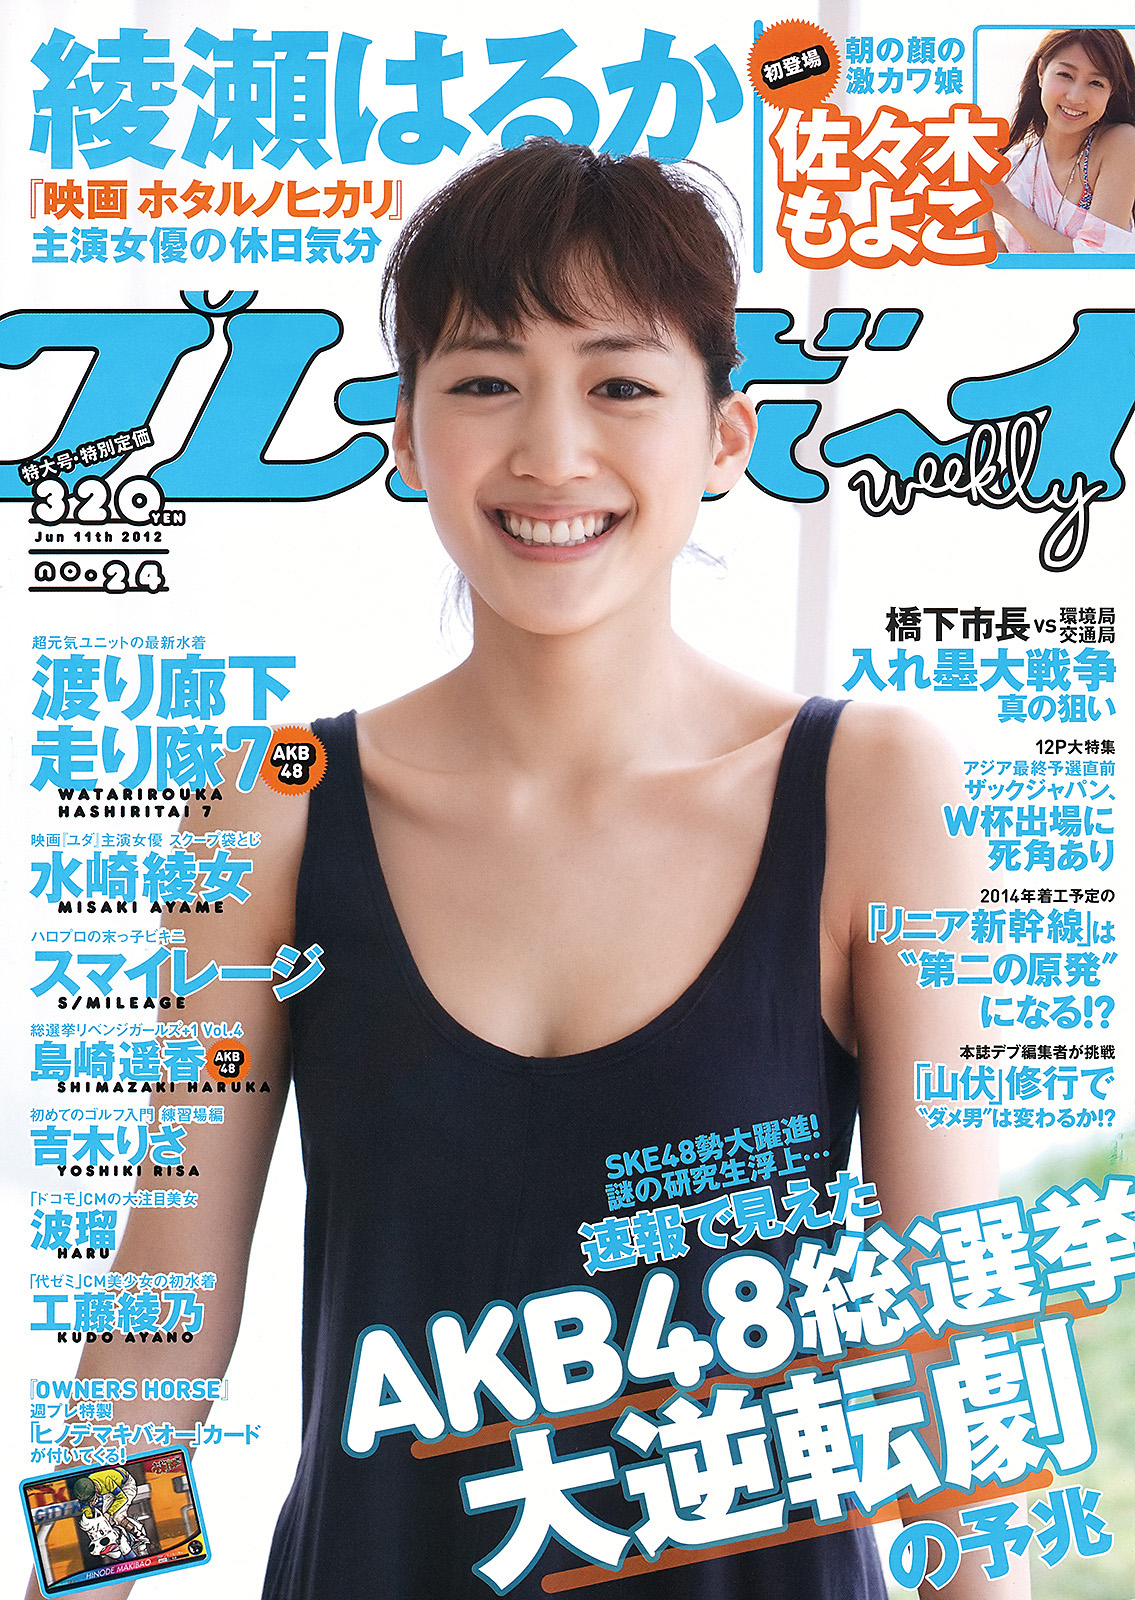 [WPB Magazine] 2012 No.24 Haruka Ayase 綾瀬はるか [44P25MB] - idols